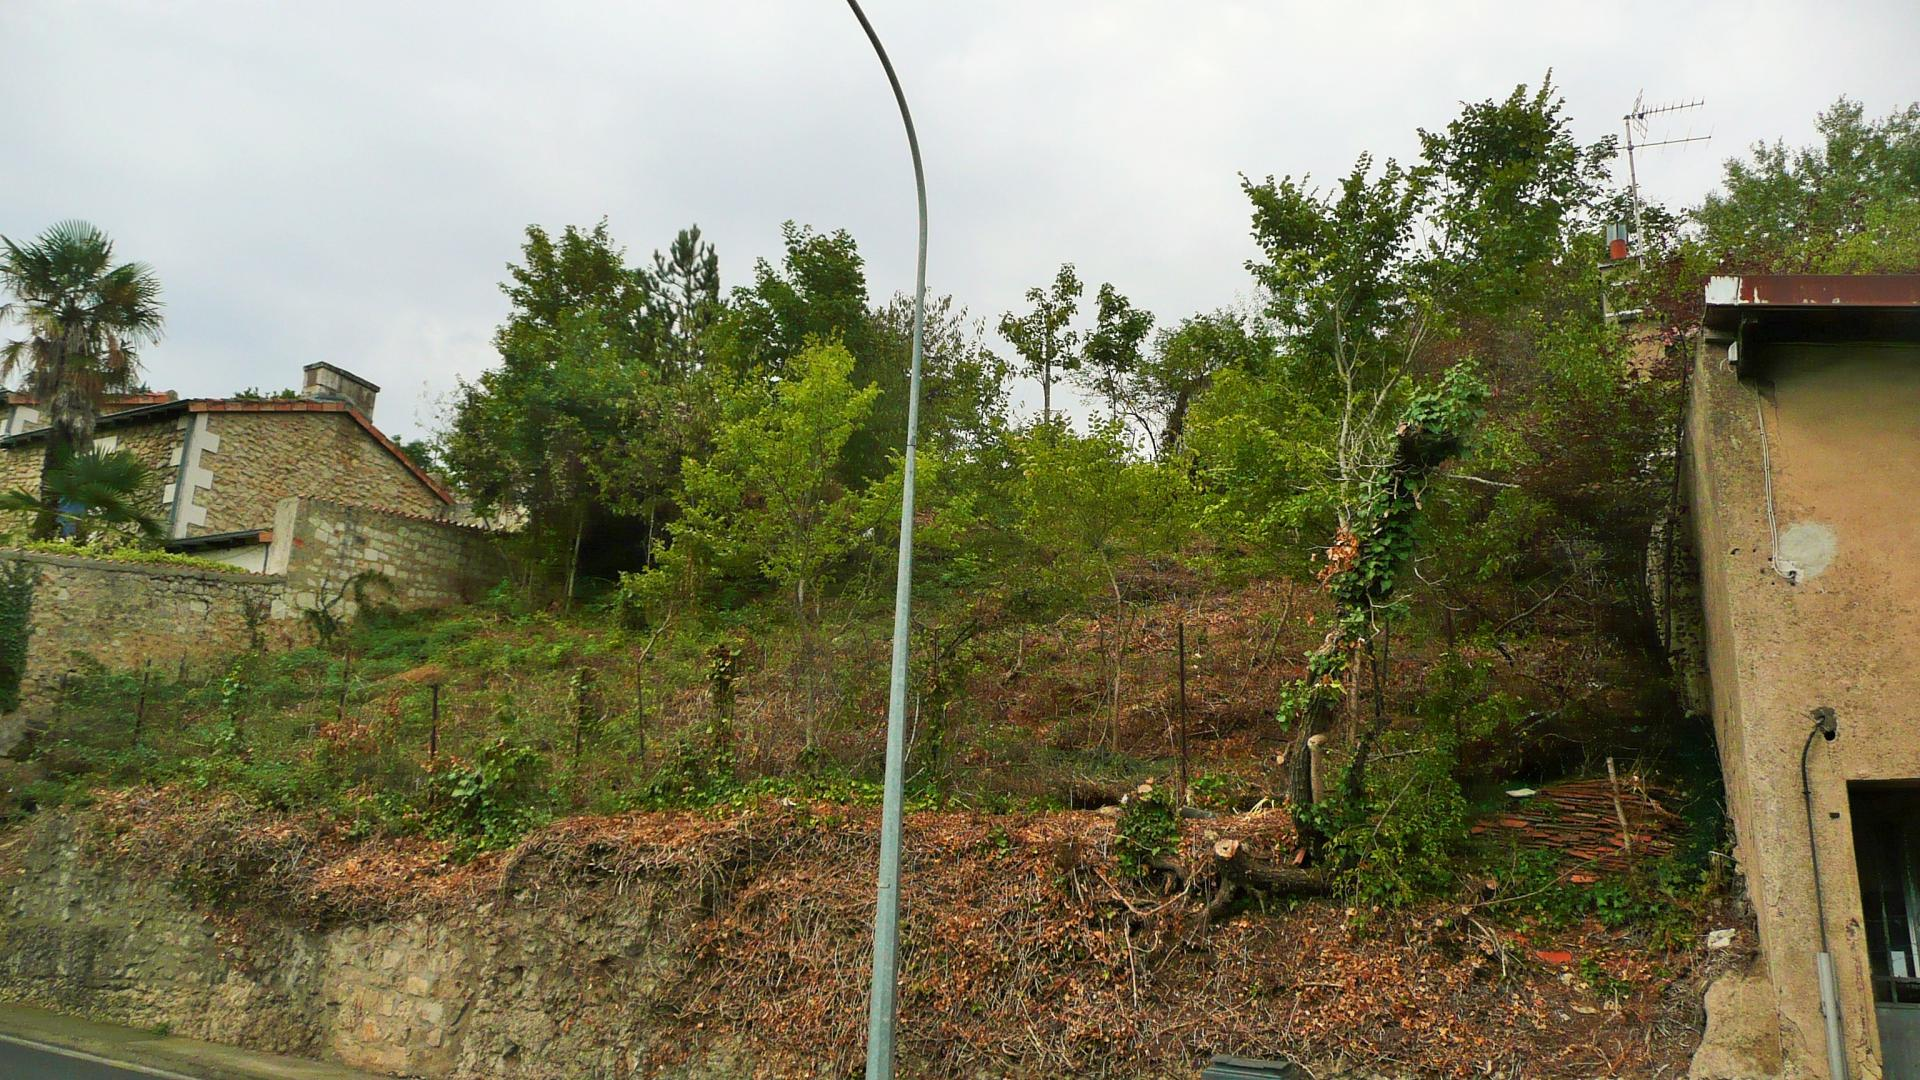 Poitiers terrain a bâtir